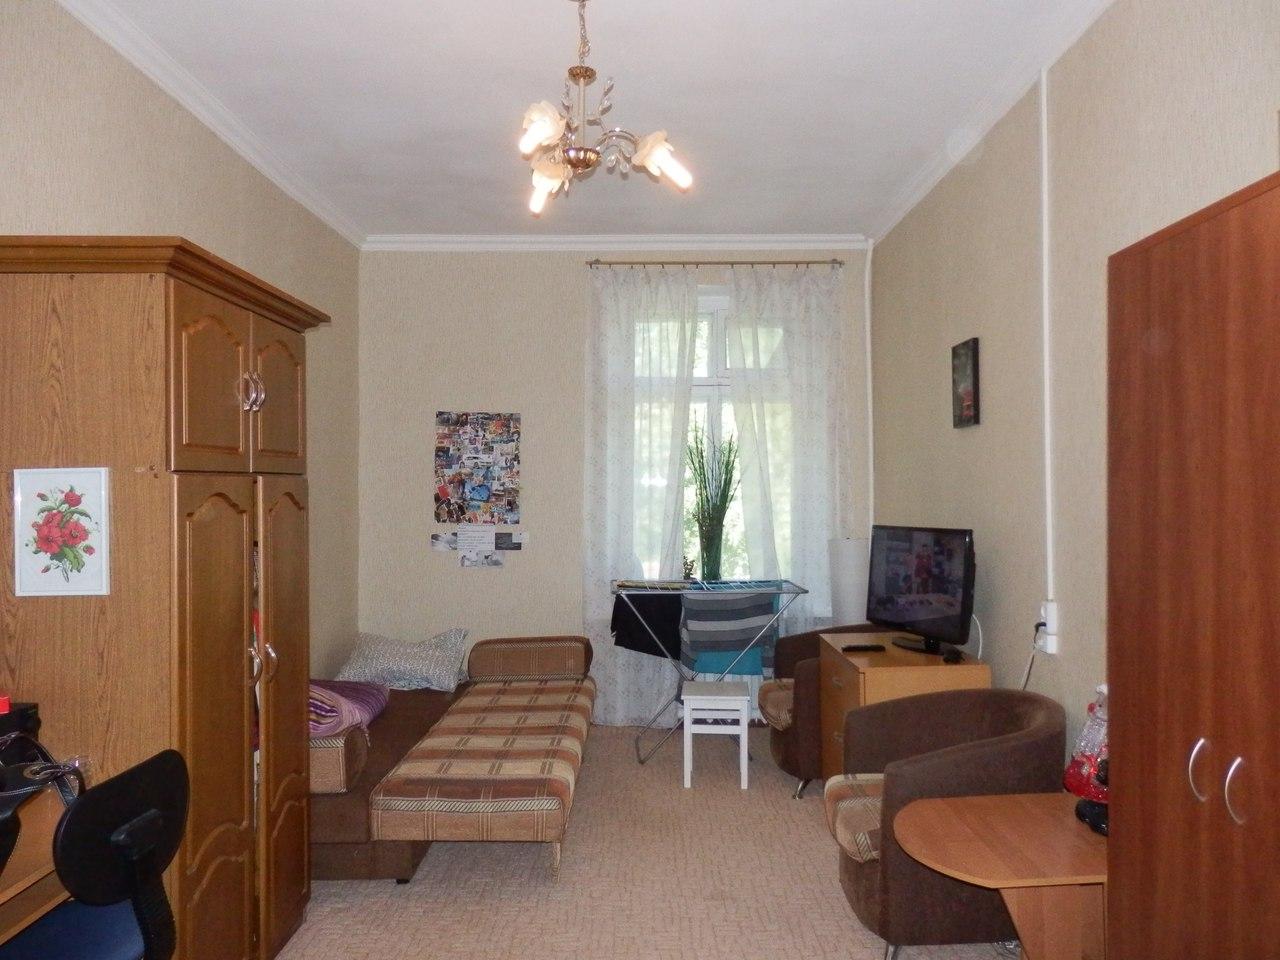 Продается 1 комната в квартире, Красногвардейский район, набережная, Петербург YJ7Nt50epKM